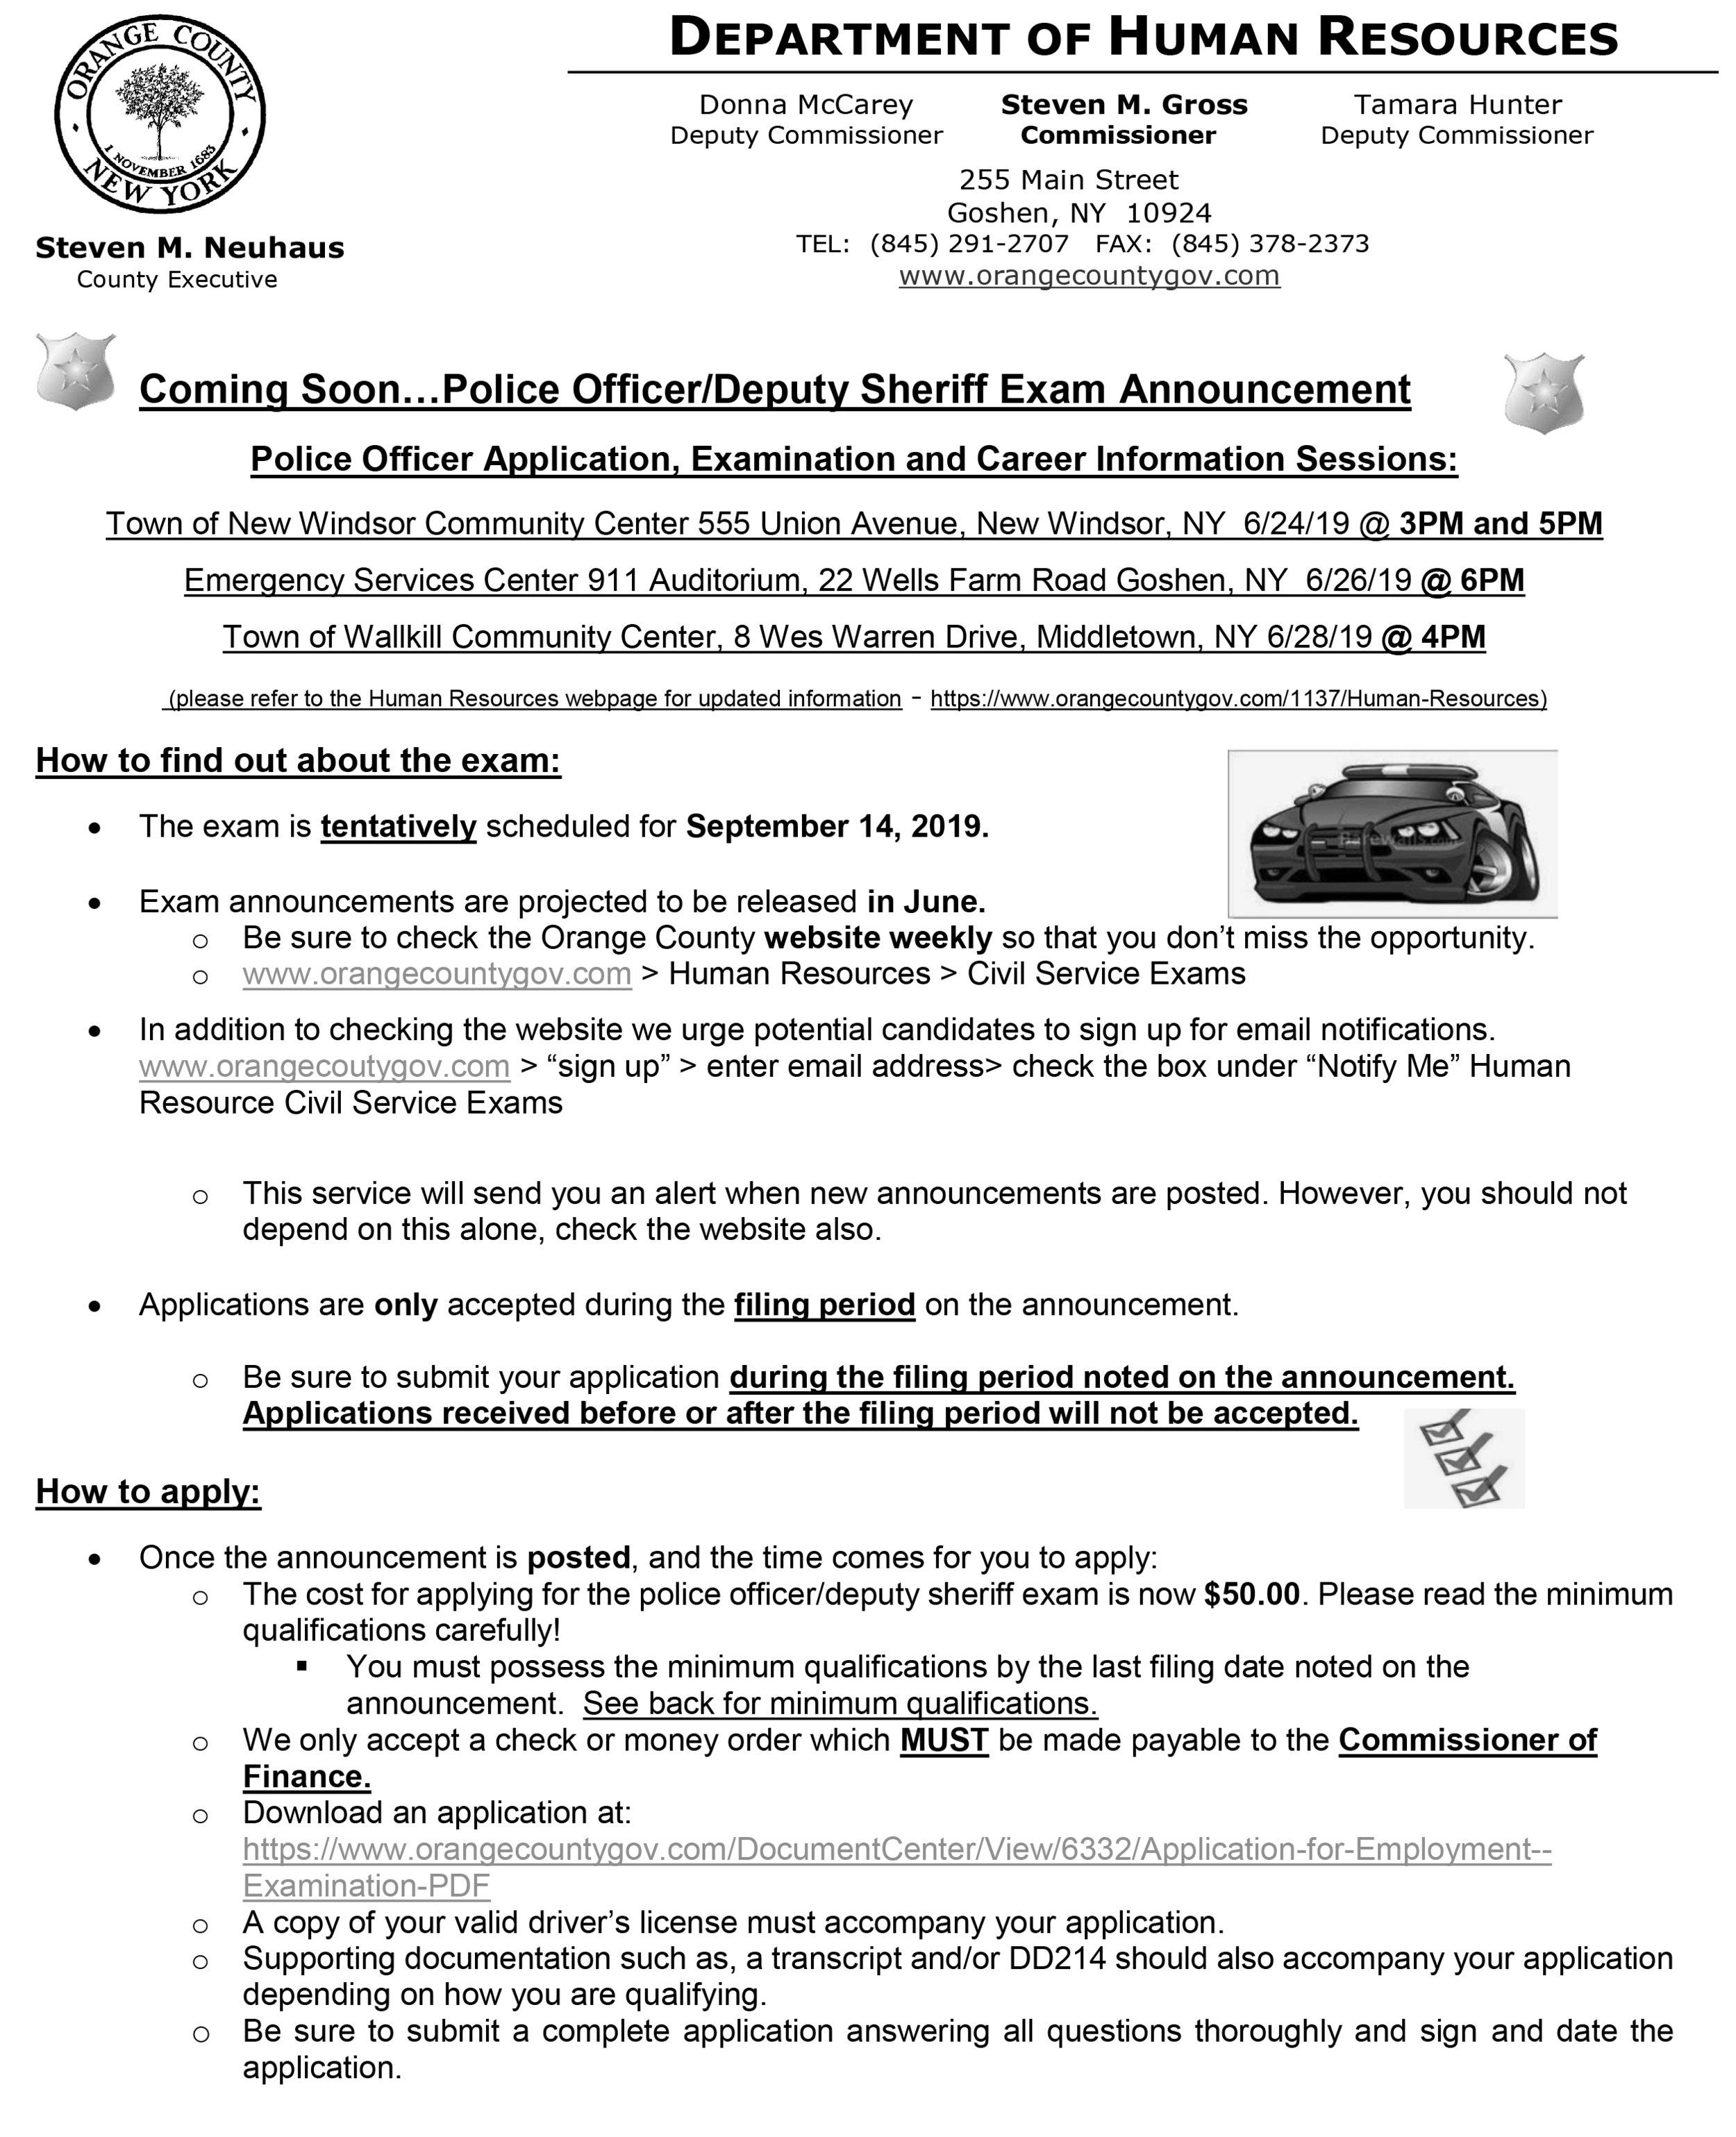 Orange County to offer Police Officer/Deputy Sheriff Exam in